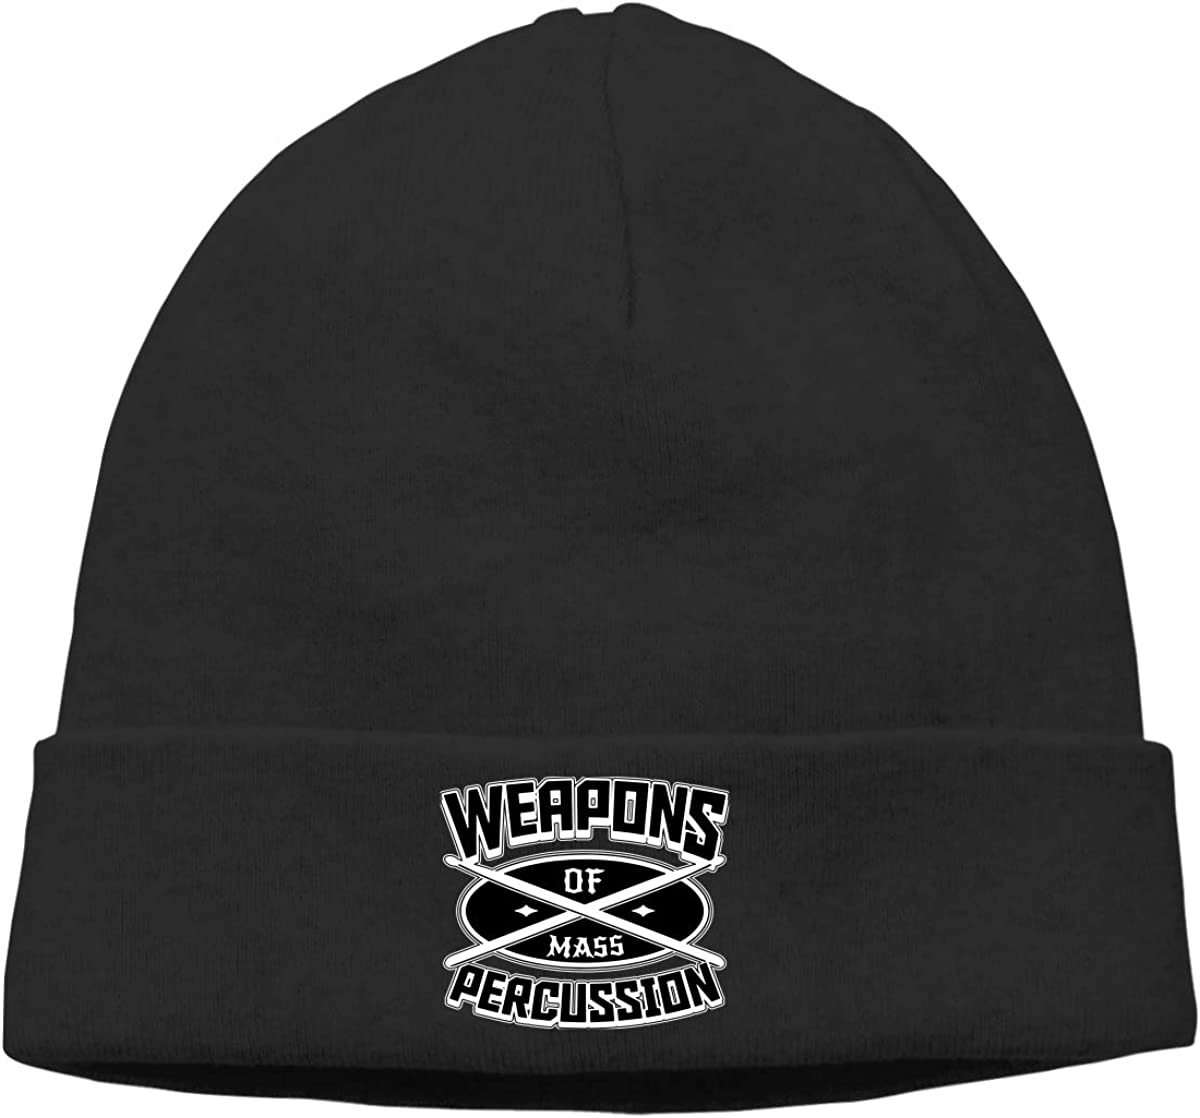 Cgi03T-2 Soft Knitting Hat Unisex Weapon Mass Percussion Skull Cap